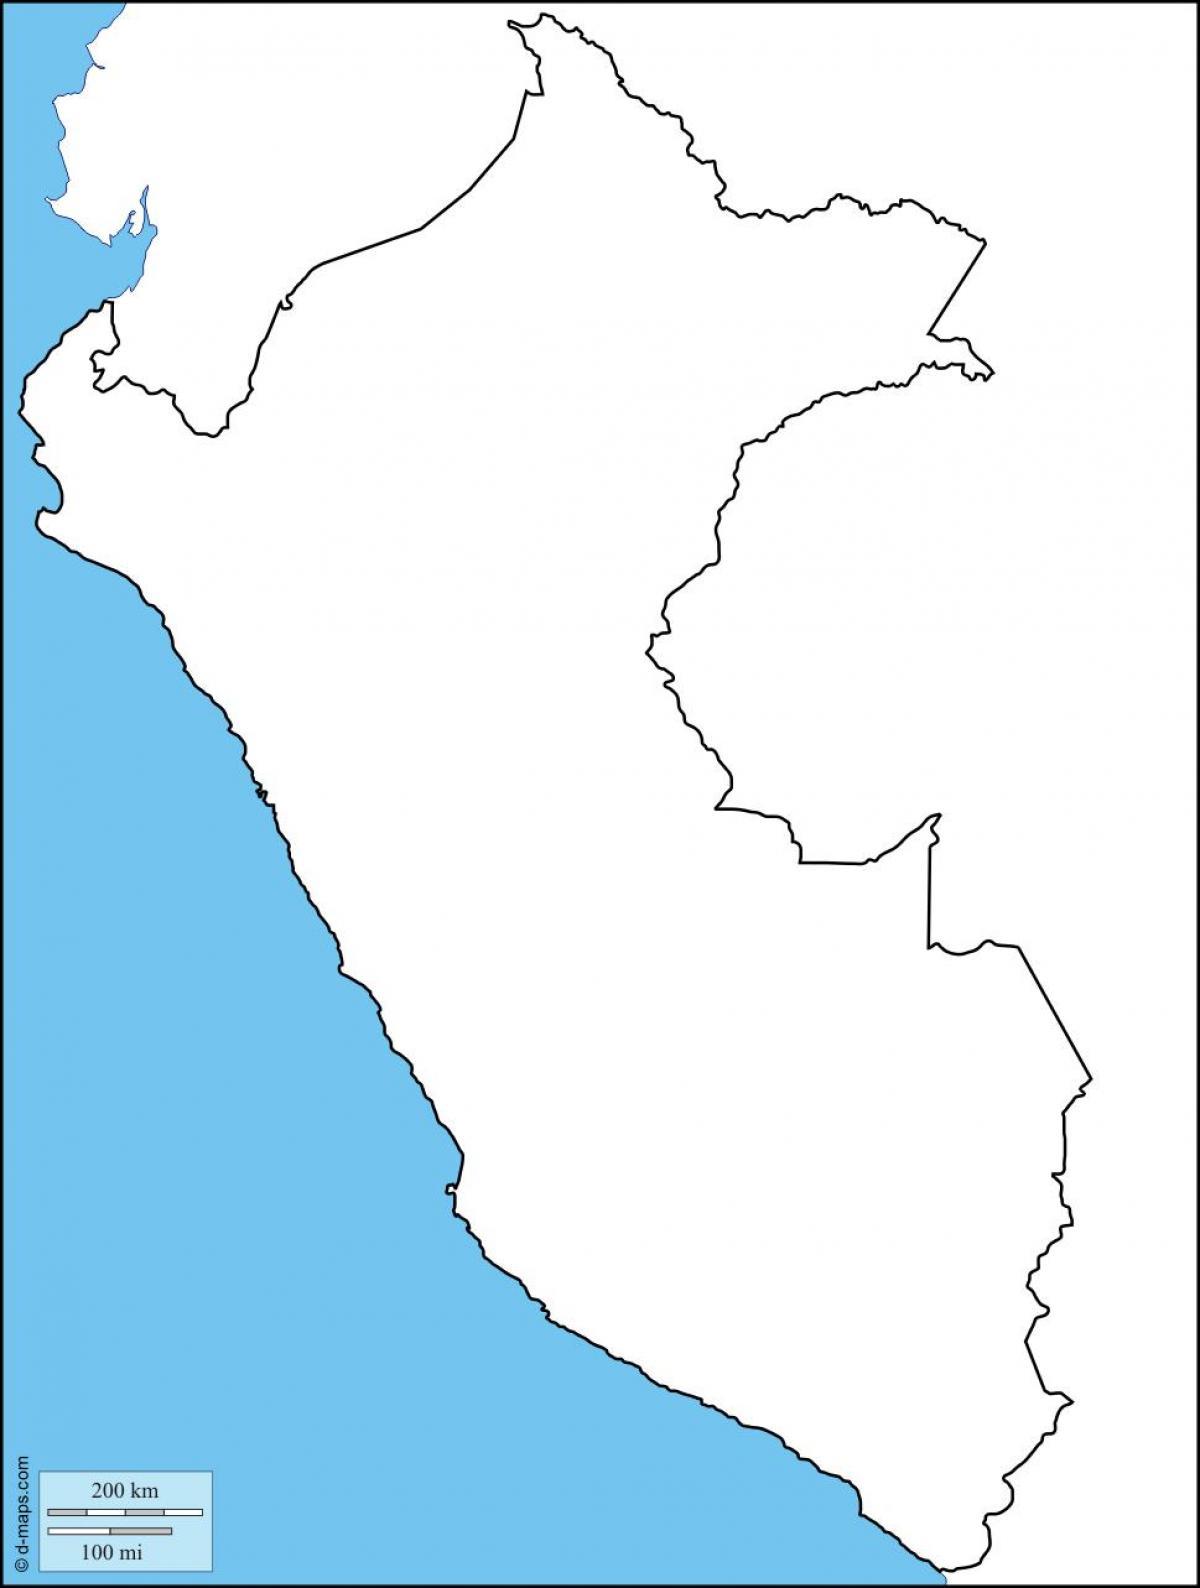 Peru Karte Umriss.Peru Karte Umriss Peru Leere Karte South America